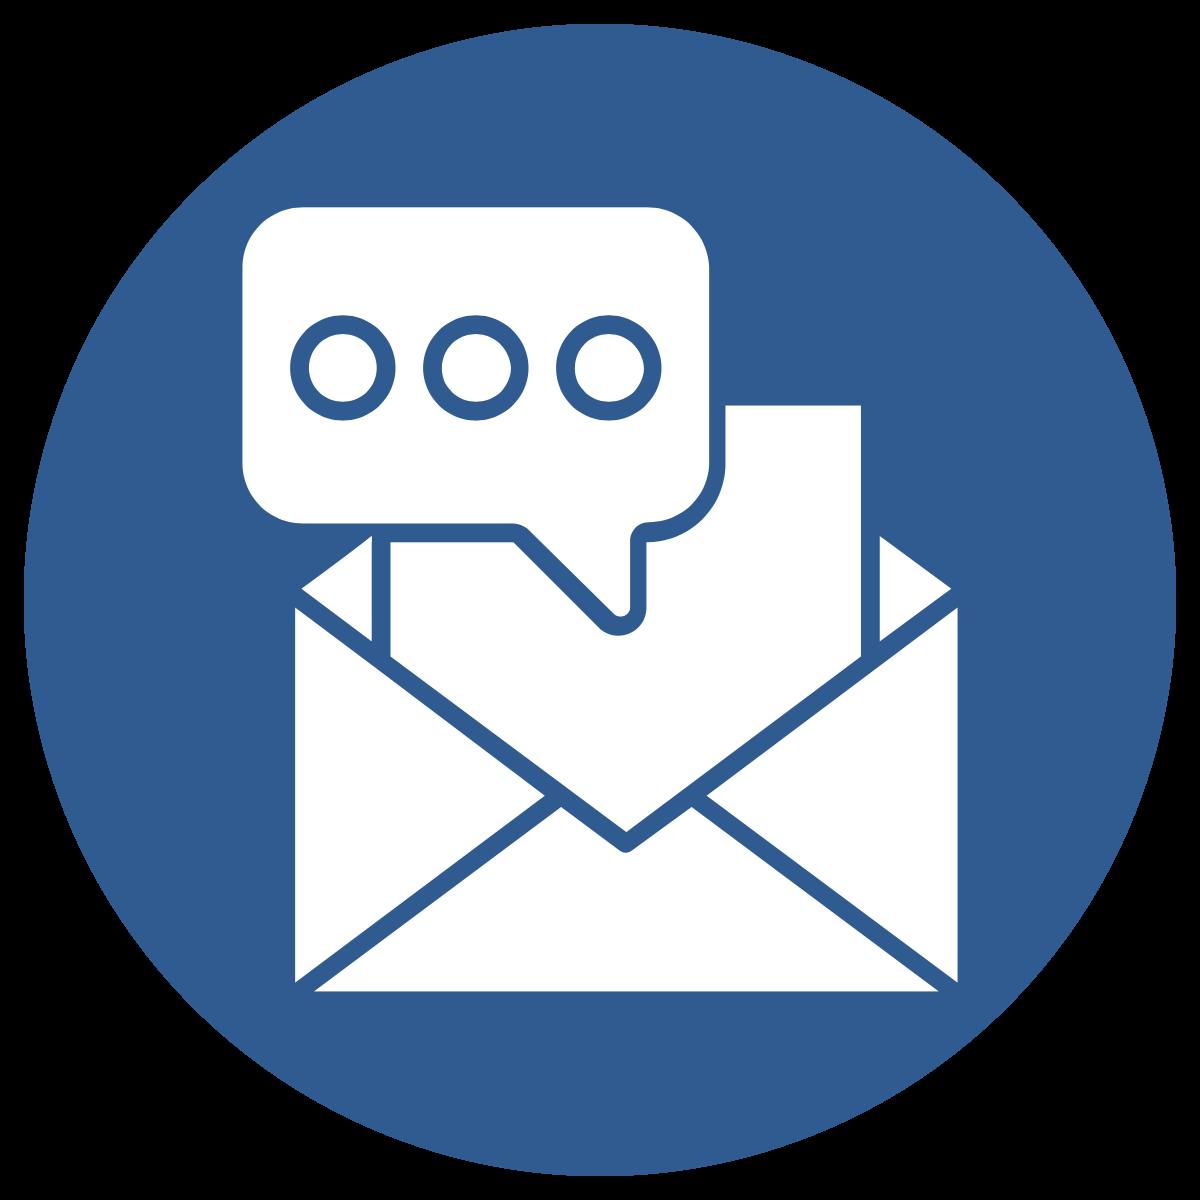 noun_Email Marketing_1861144.png